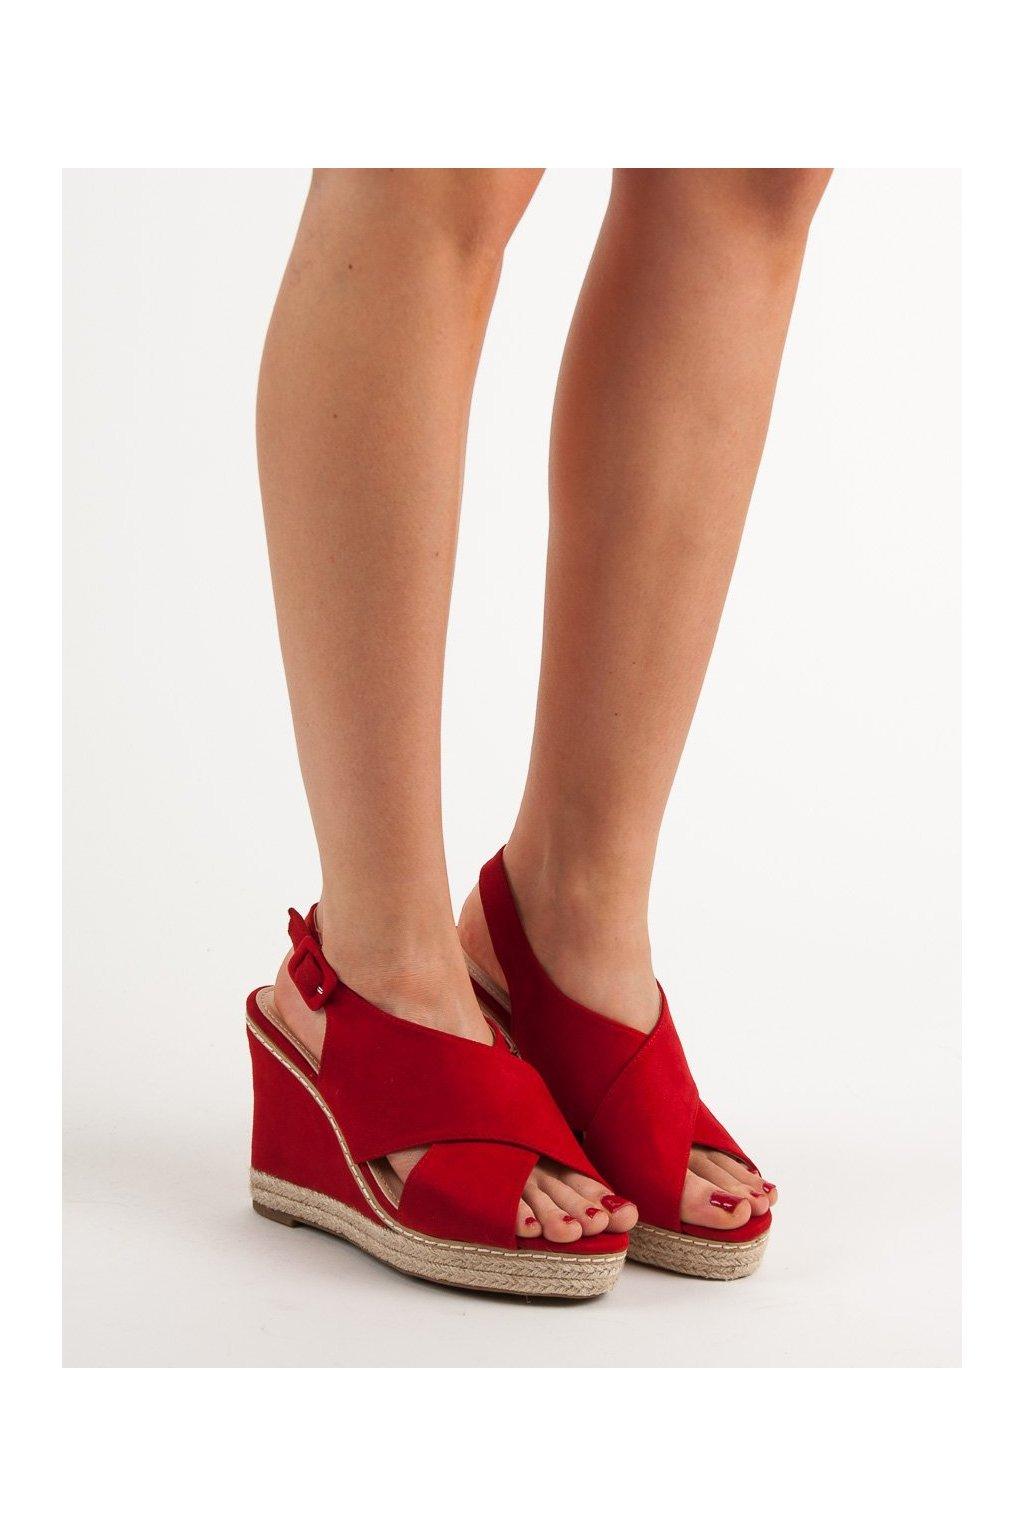 Červené sandále Anesia paris kod 66-368R